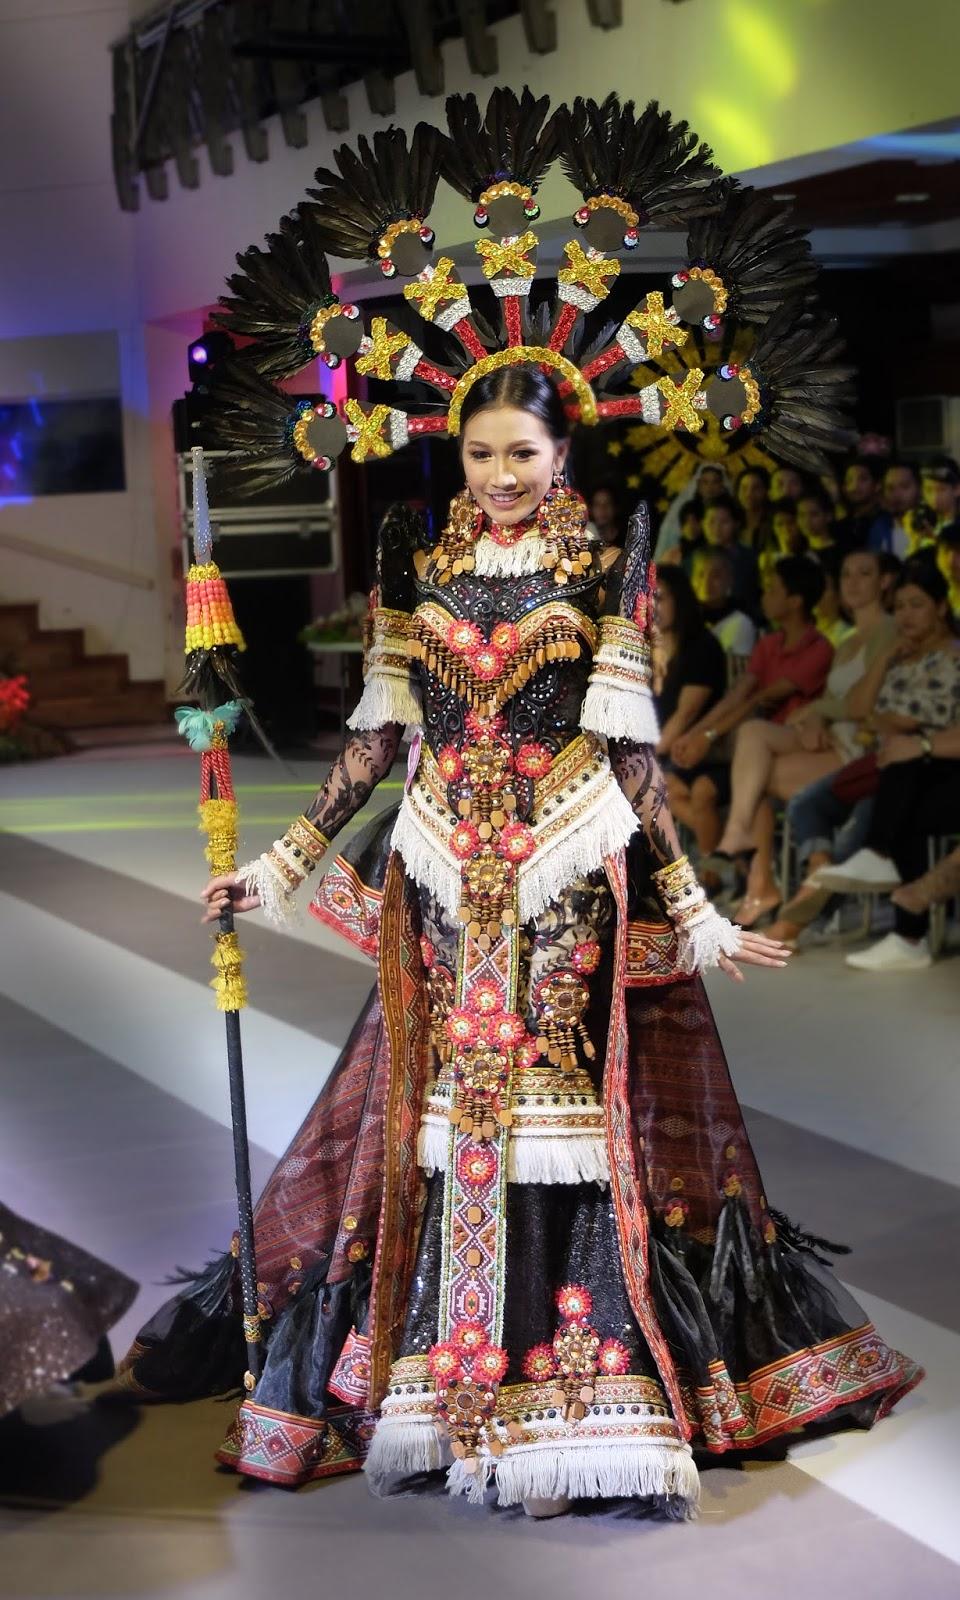 Ati-atihan Festival Kalibo Aklan by Nicole Salih Festival de las Bellas y Flores Gown Competition National Costume